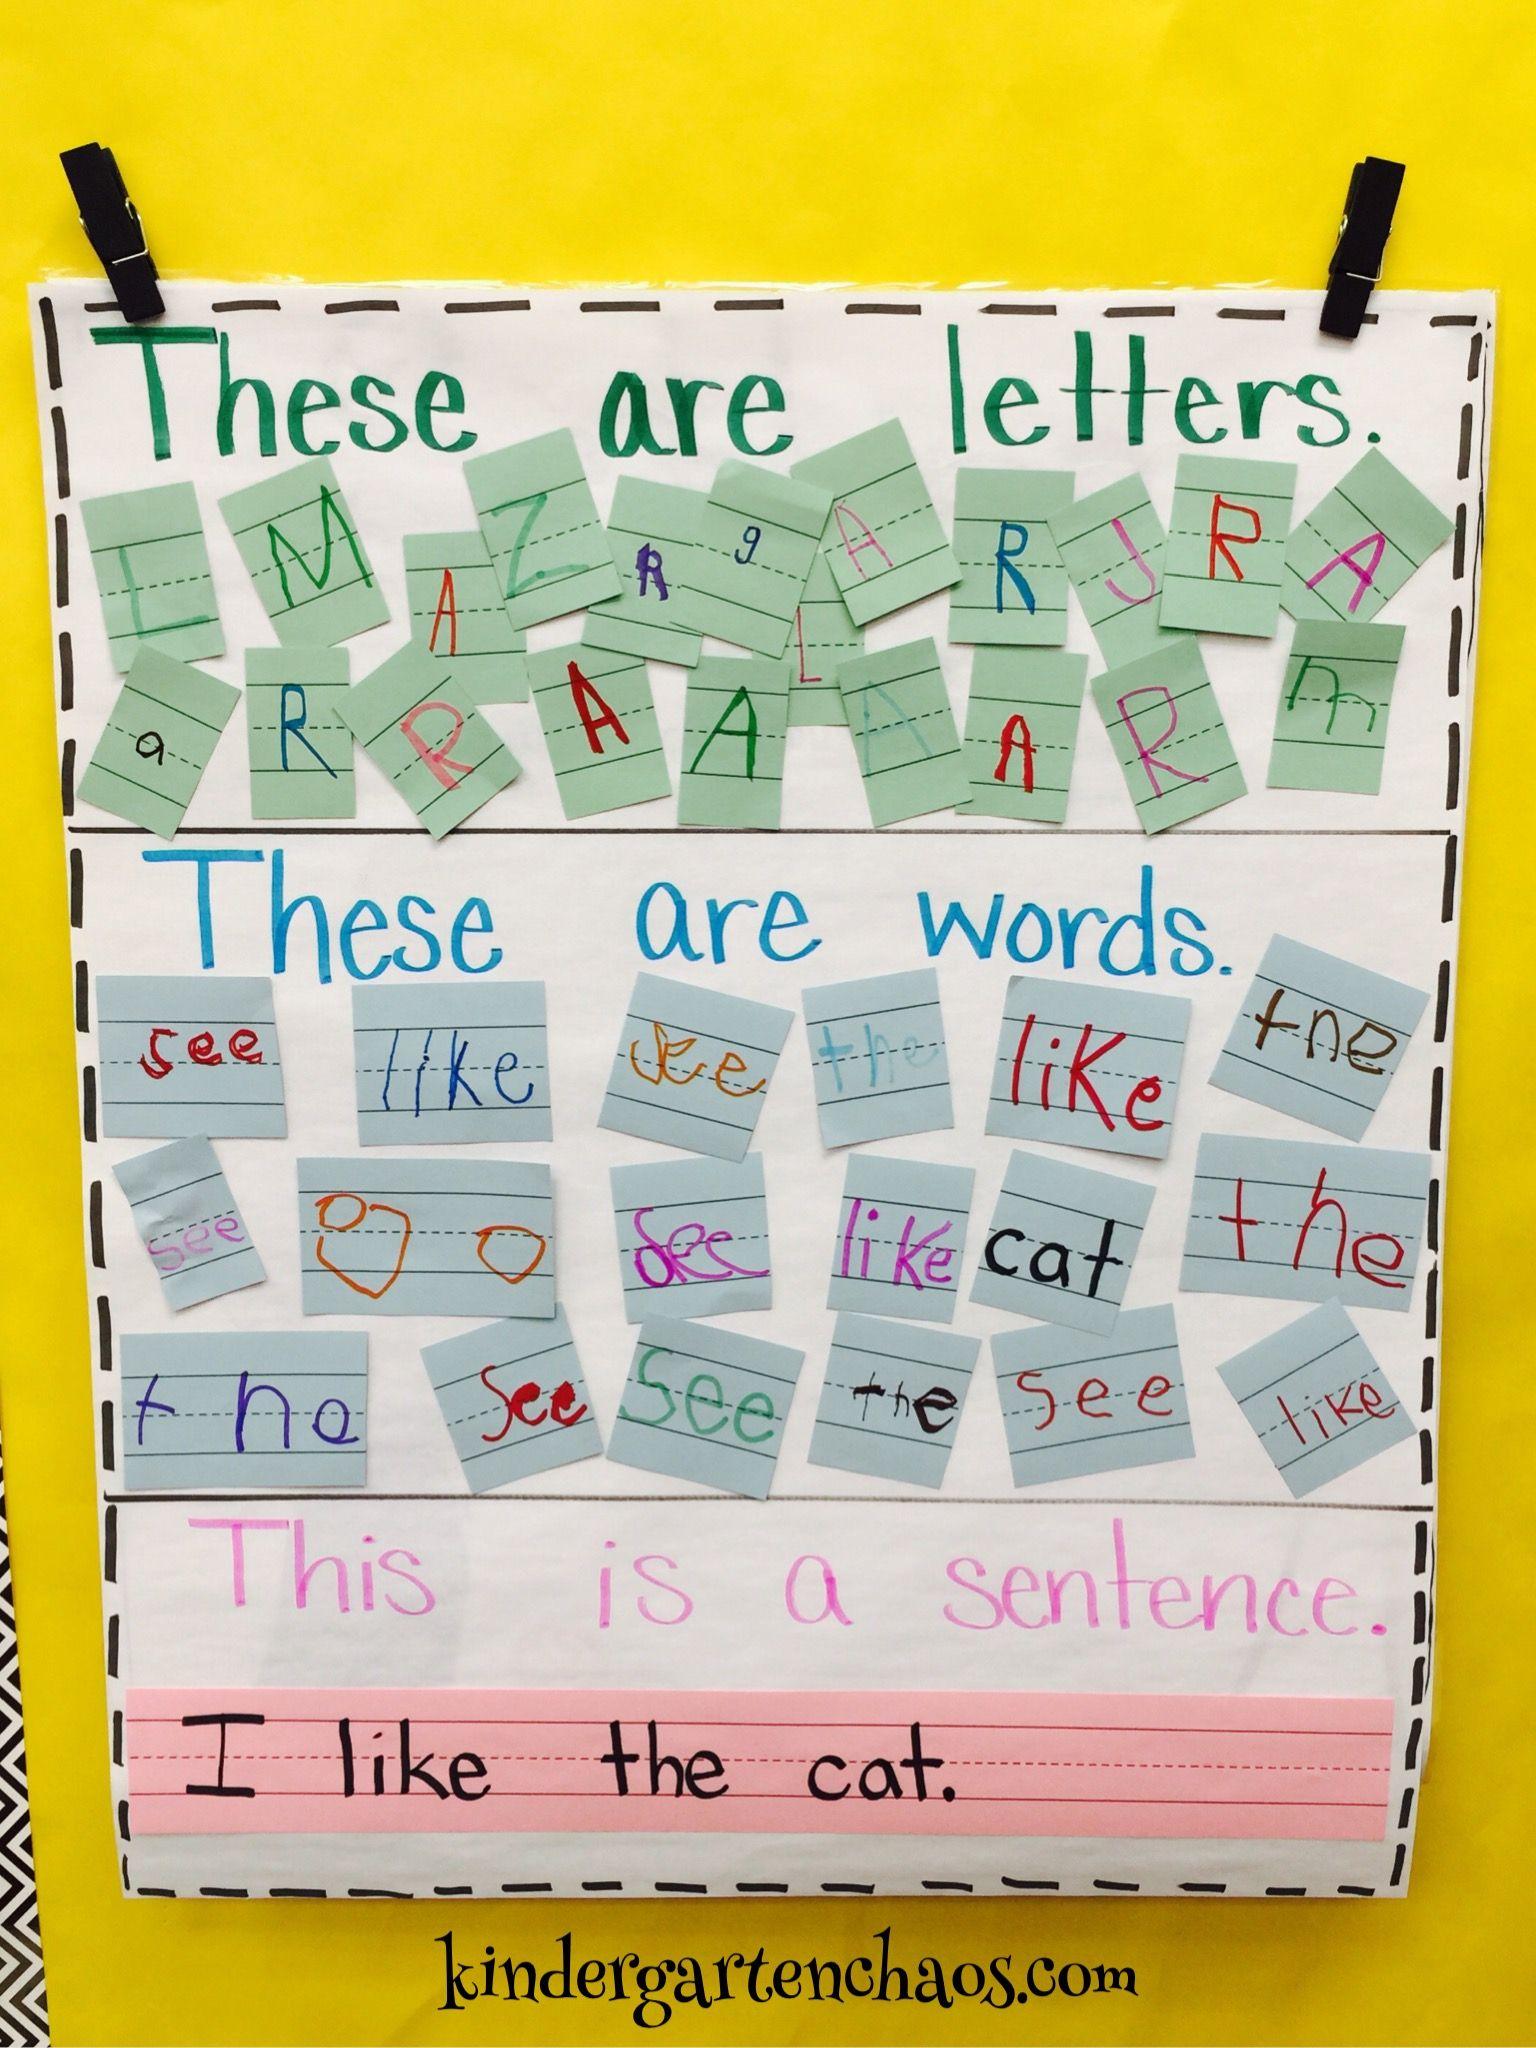 Scrapbook ideas kindergarten - 60 Must Make Kindergarten Anchor Charts For The Classroom Covers Classroom Management Literacy